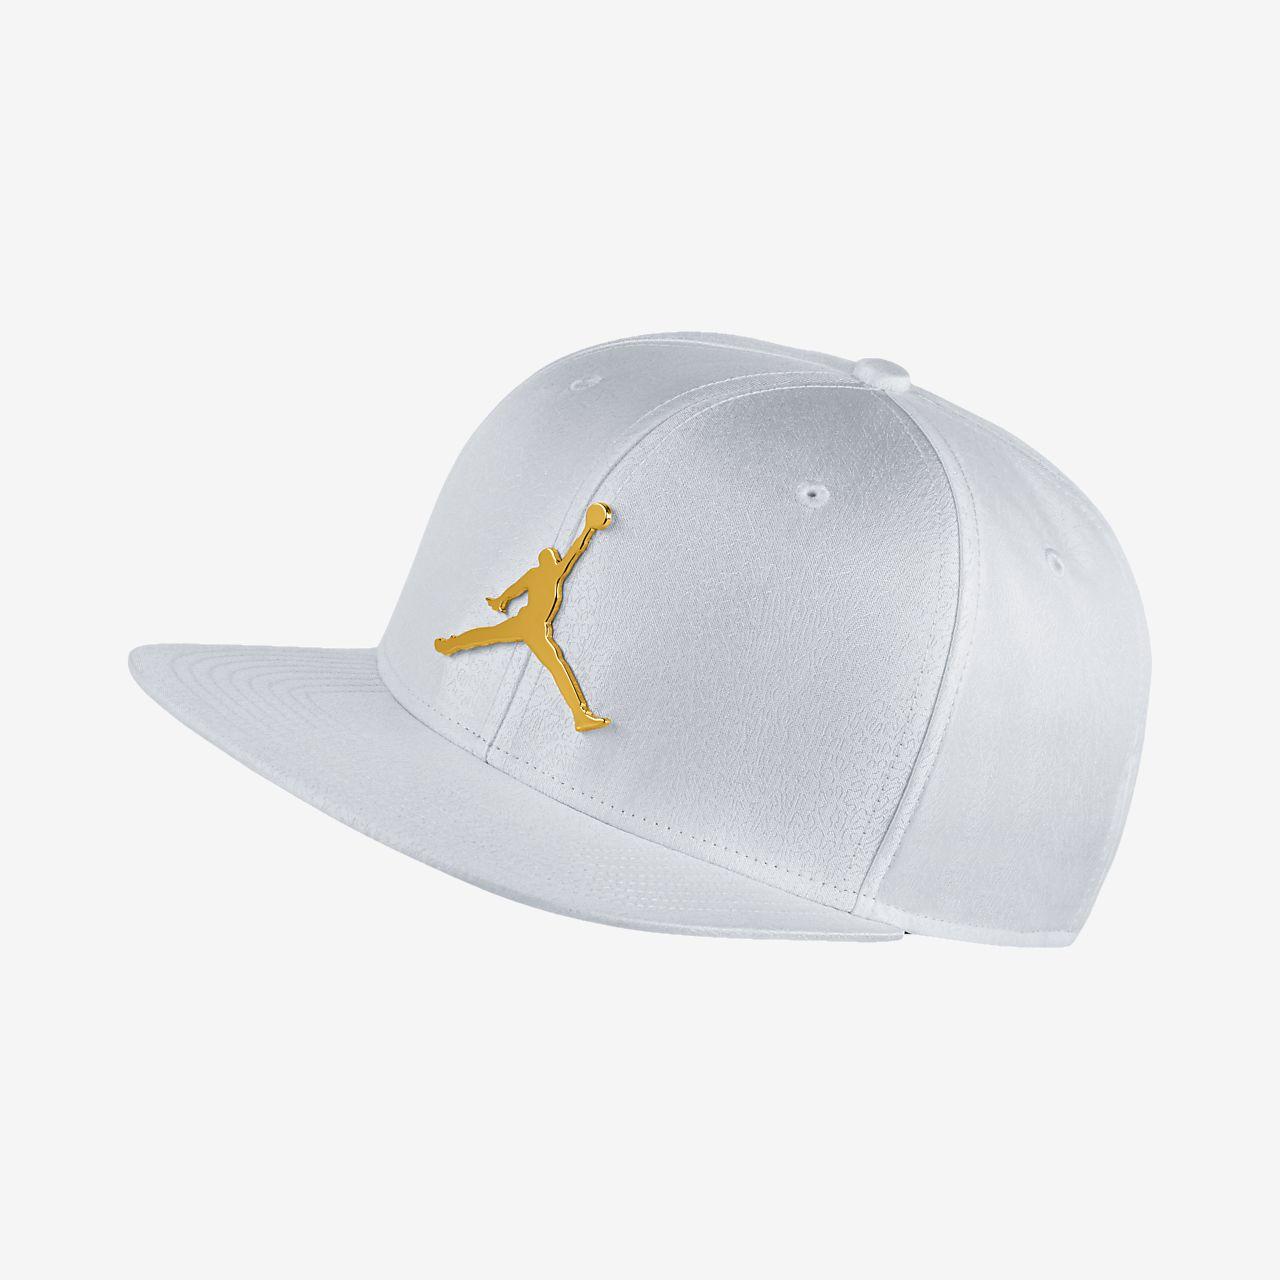 a6c57063 ... where to buy jordan jumpman adjustable cap price 593bb 3792d ...